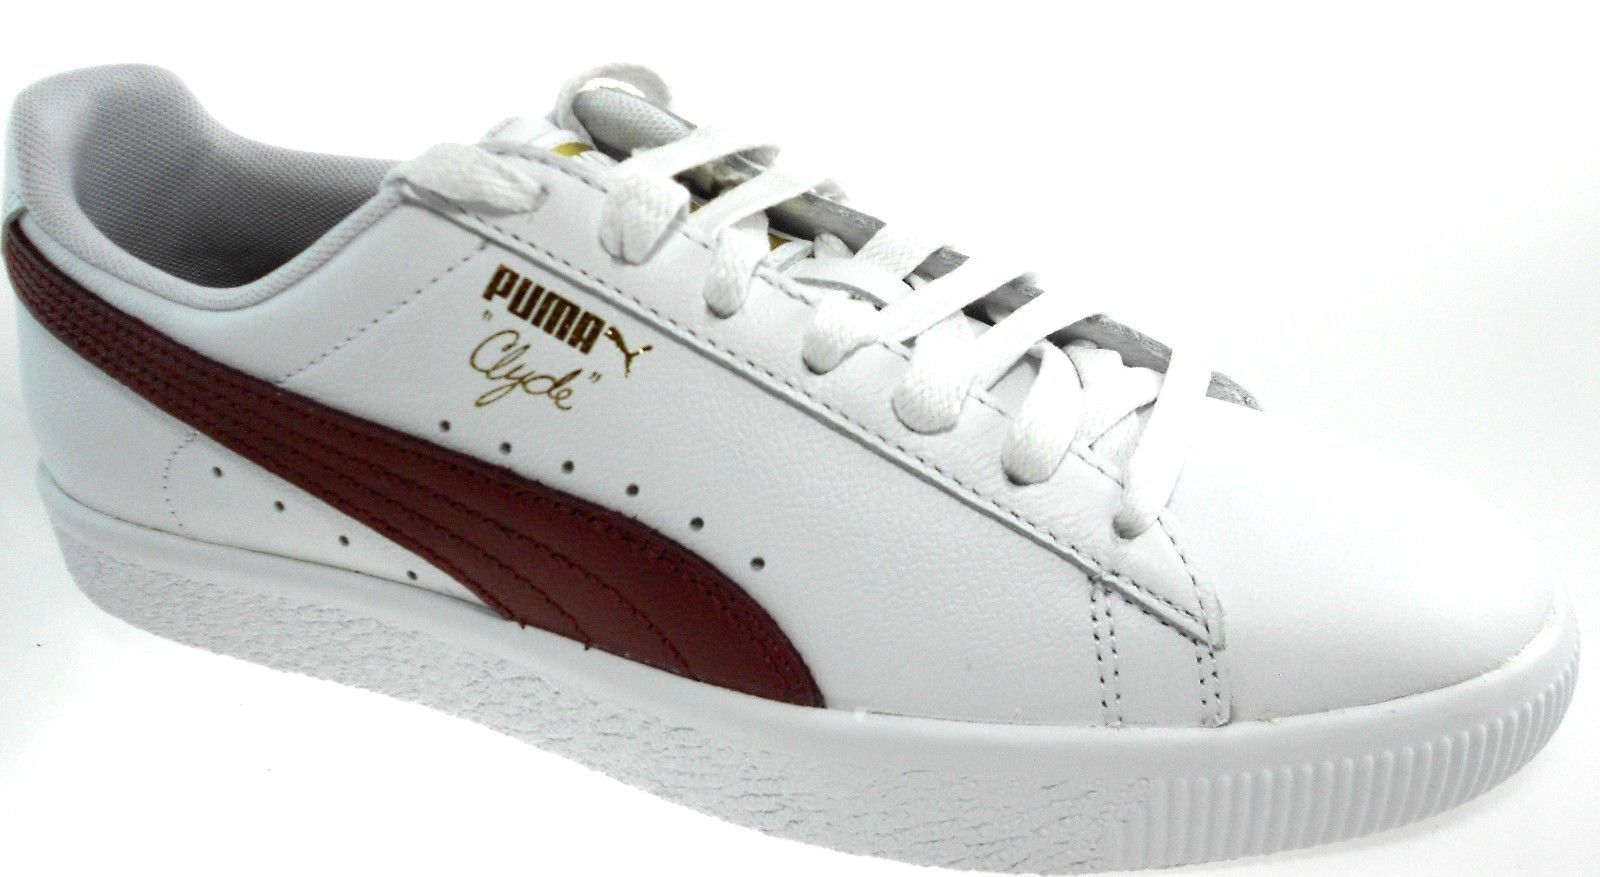 Puma Clyde Core L Foil Men s Classic White and 50 similar items 944c72b29